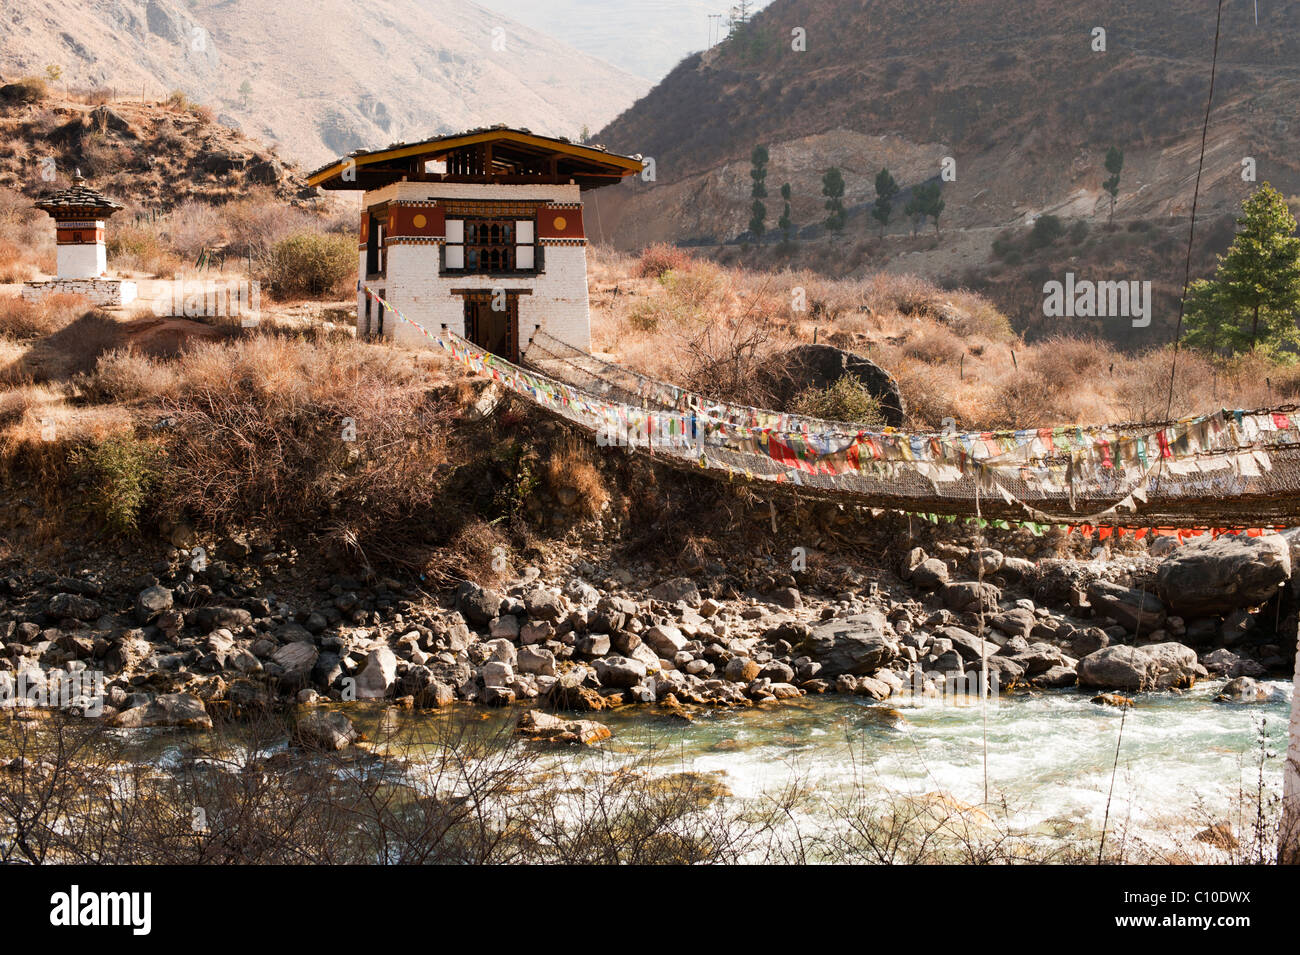 Bhutanese pedestrian suspension bridge over a river at the Temple of the Iron Master near Paro, Bhutan - Stock Image